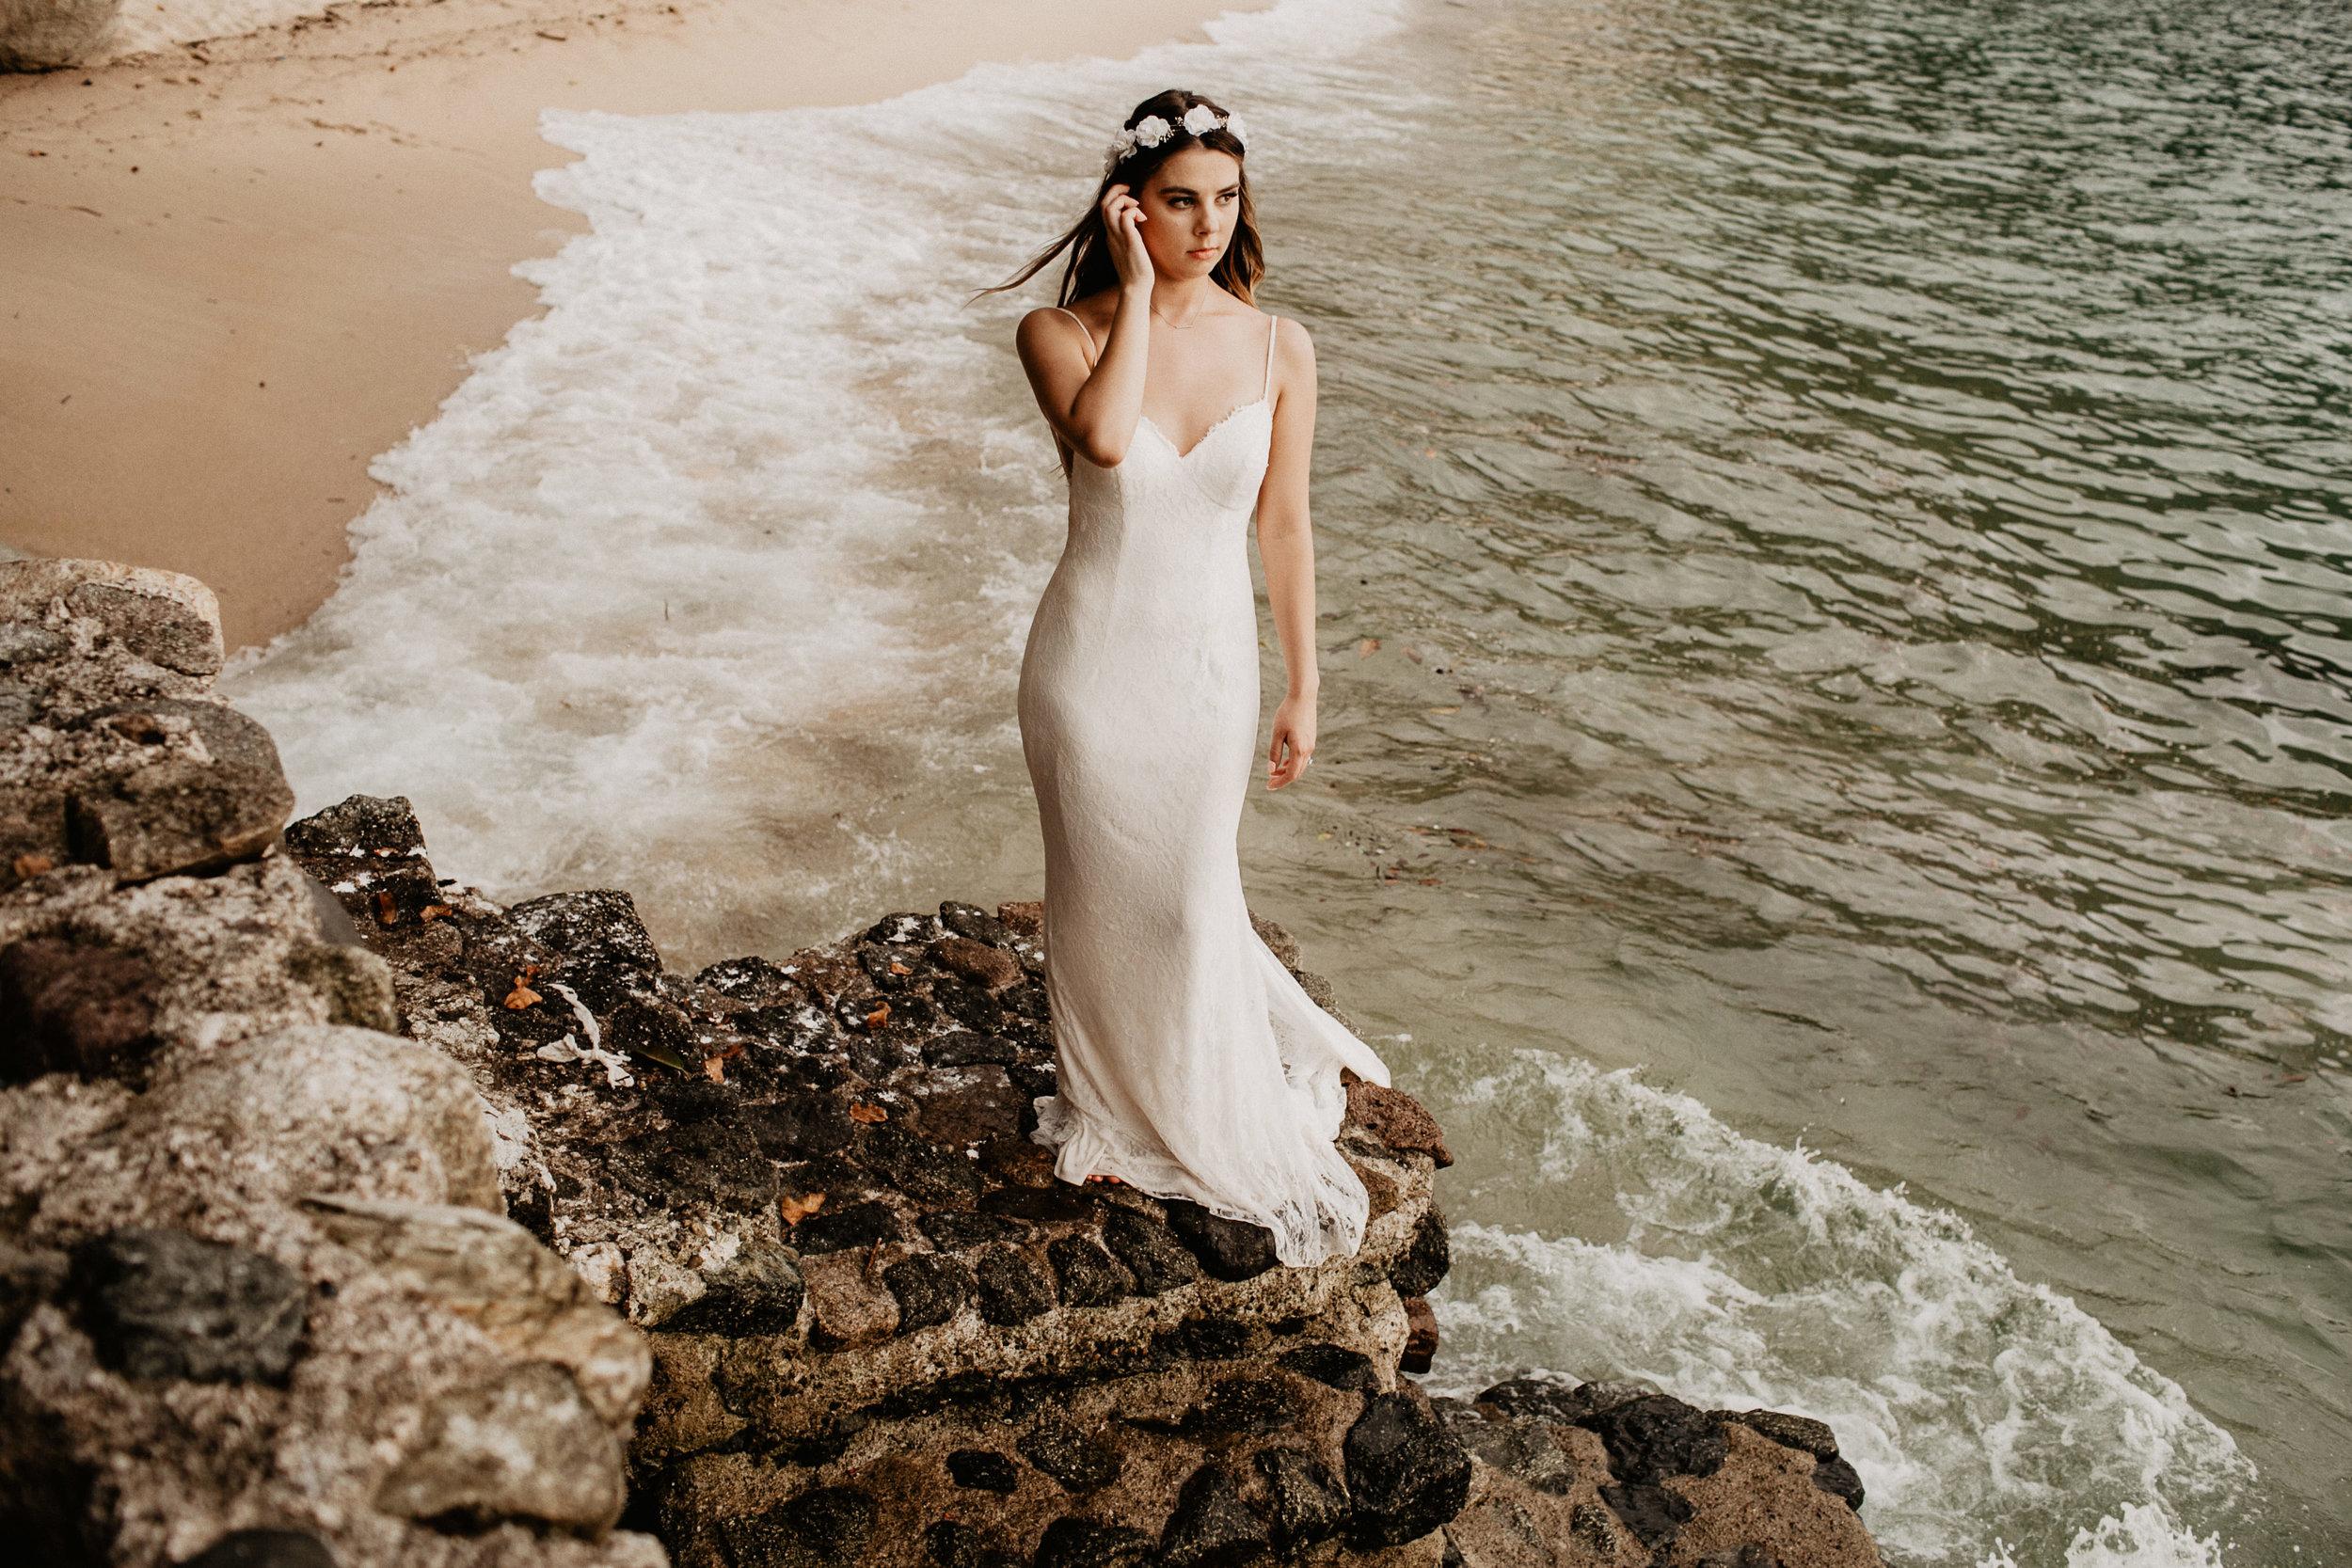 alfonso_flores_destination_wedding_photography_puerto_vallarta_hotel_barcelo_vallarta_cuttler_amela-736.JPG